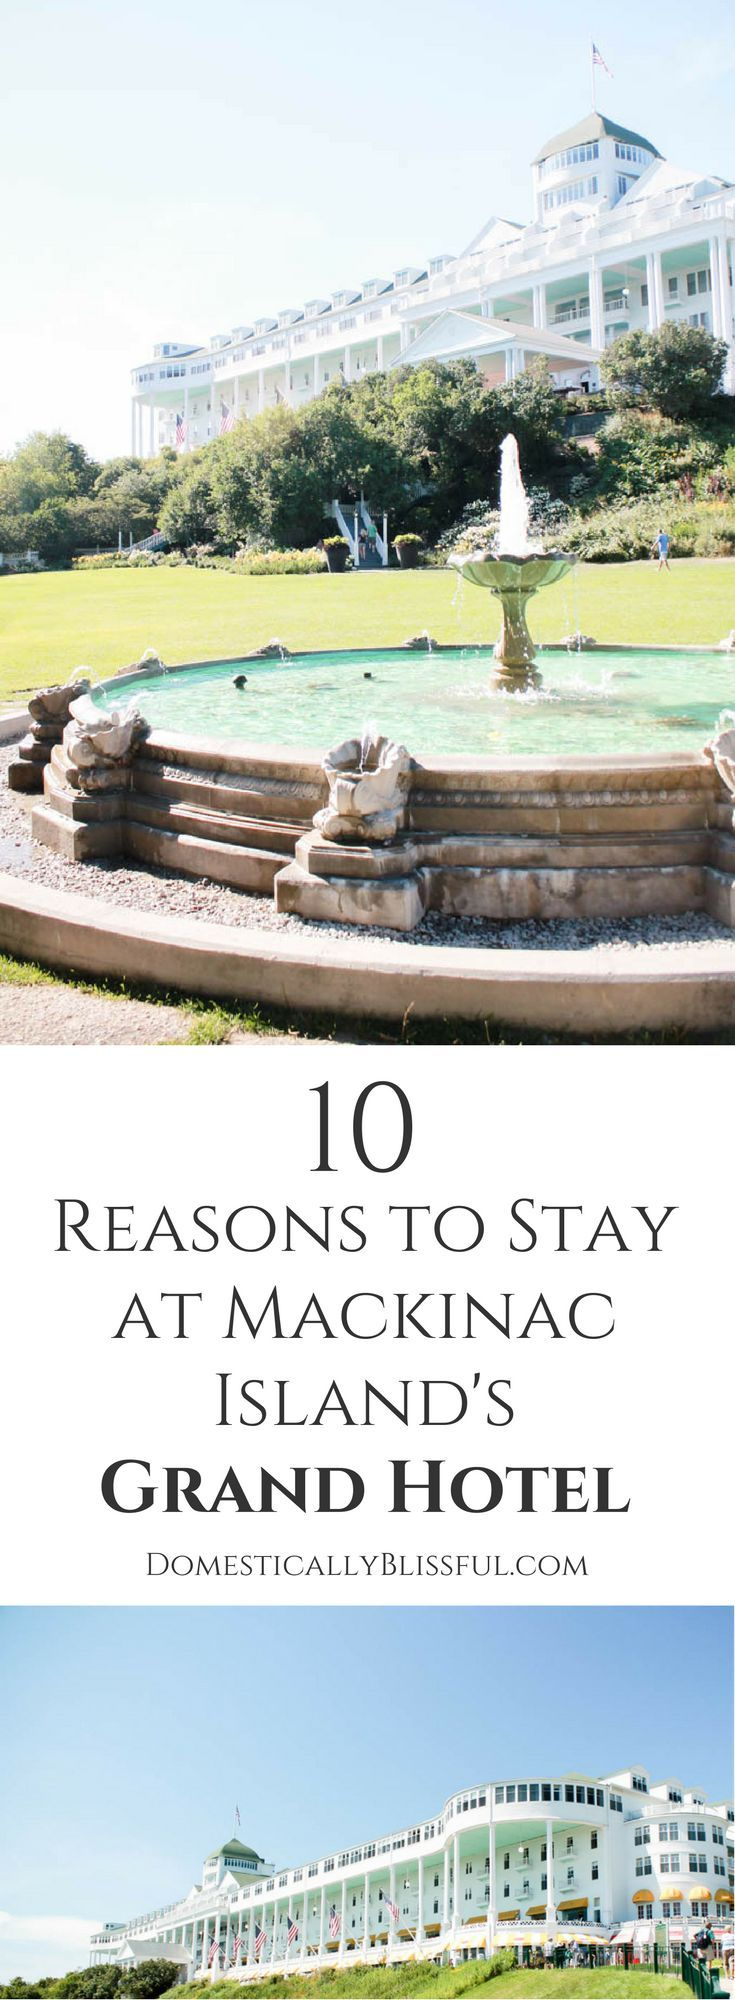 10 Reasons To Stay At Mackinac Island S Grand Hotel Grand Hotel Mackinac Island Mackinac Island Mackinac Island Michigan